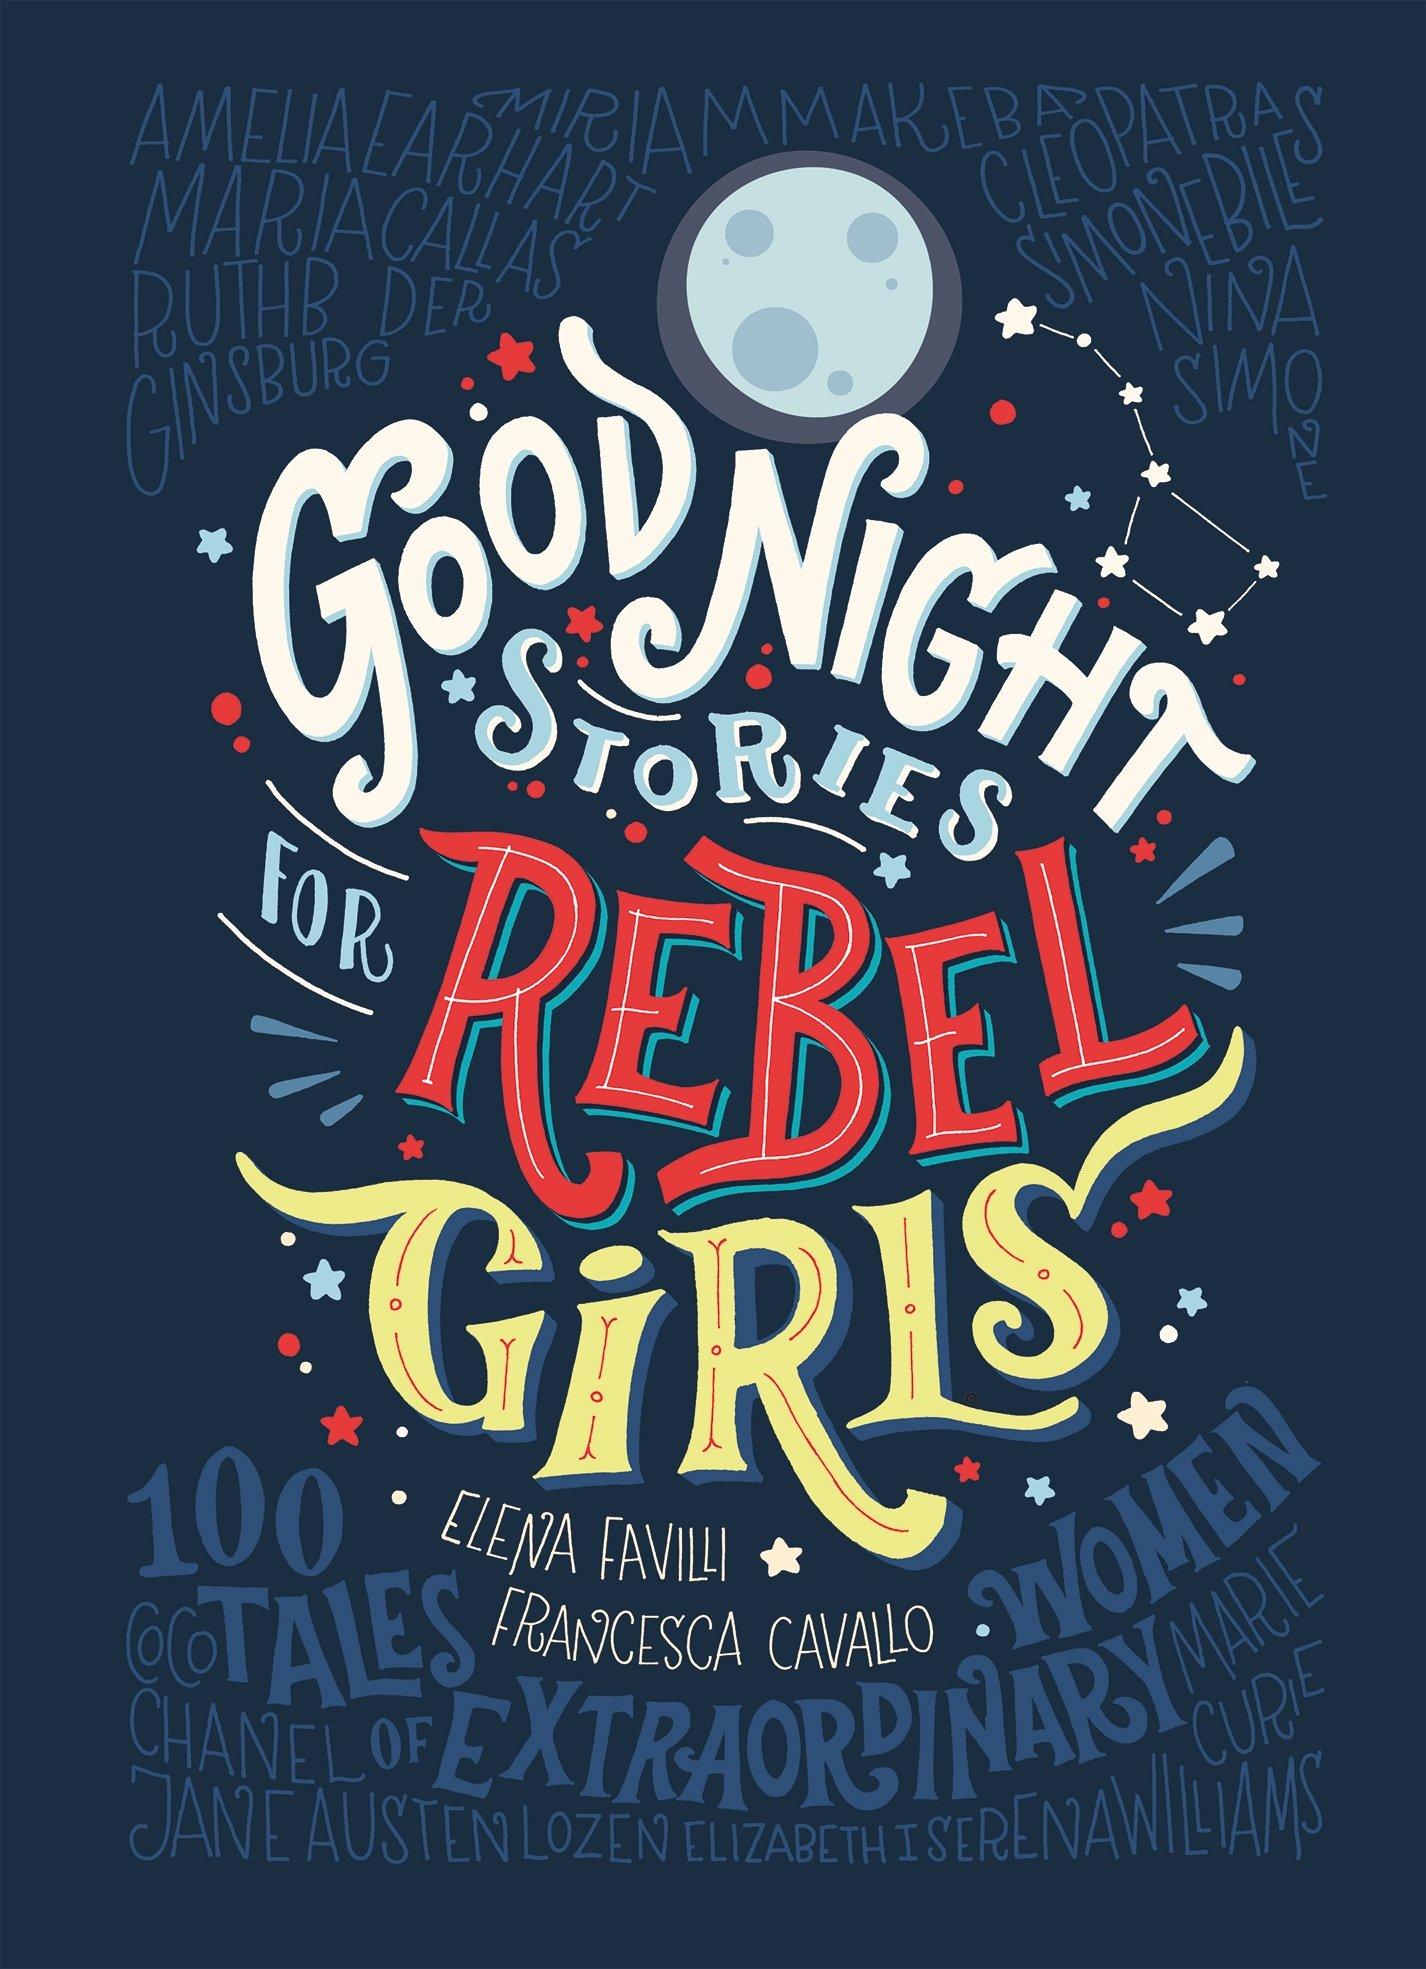 Good Night Stories for Rebel Girls: 100 tales of extraordinary women:  Amazon.co.uk: Elena Favilli, Francesca Cavallo: 0642688063955: Books